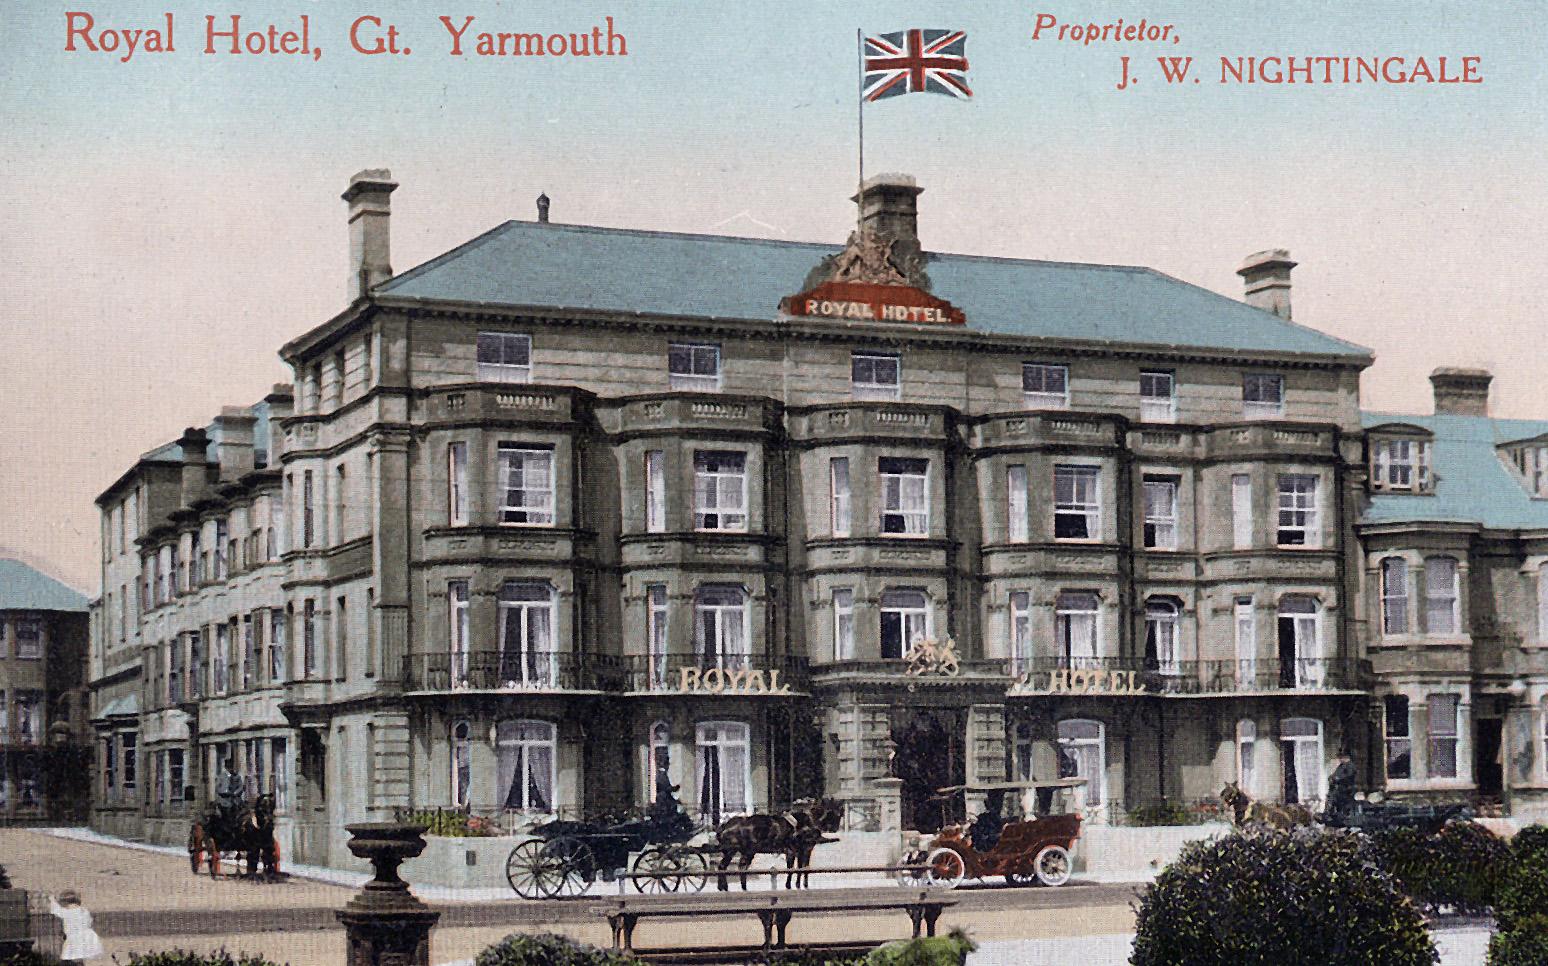 Royal Hotel 1912